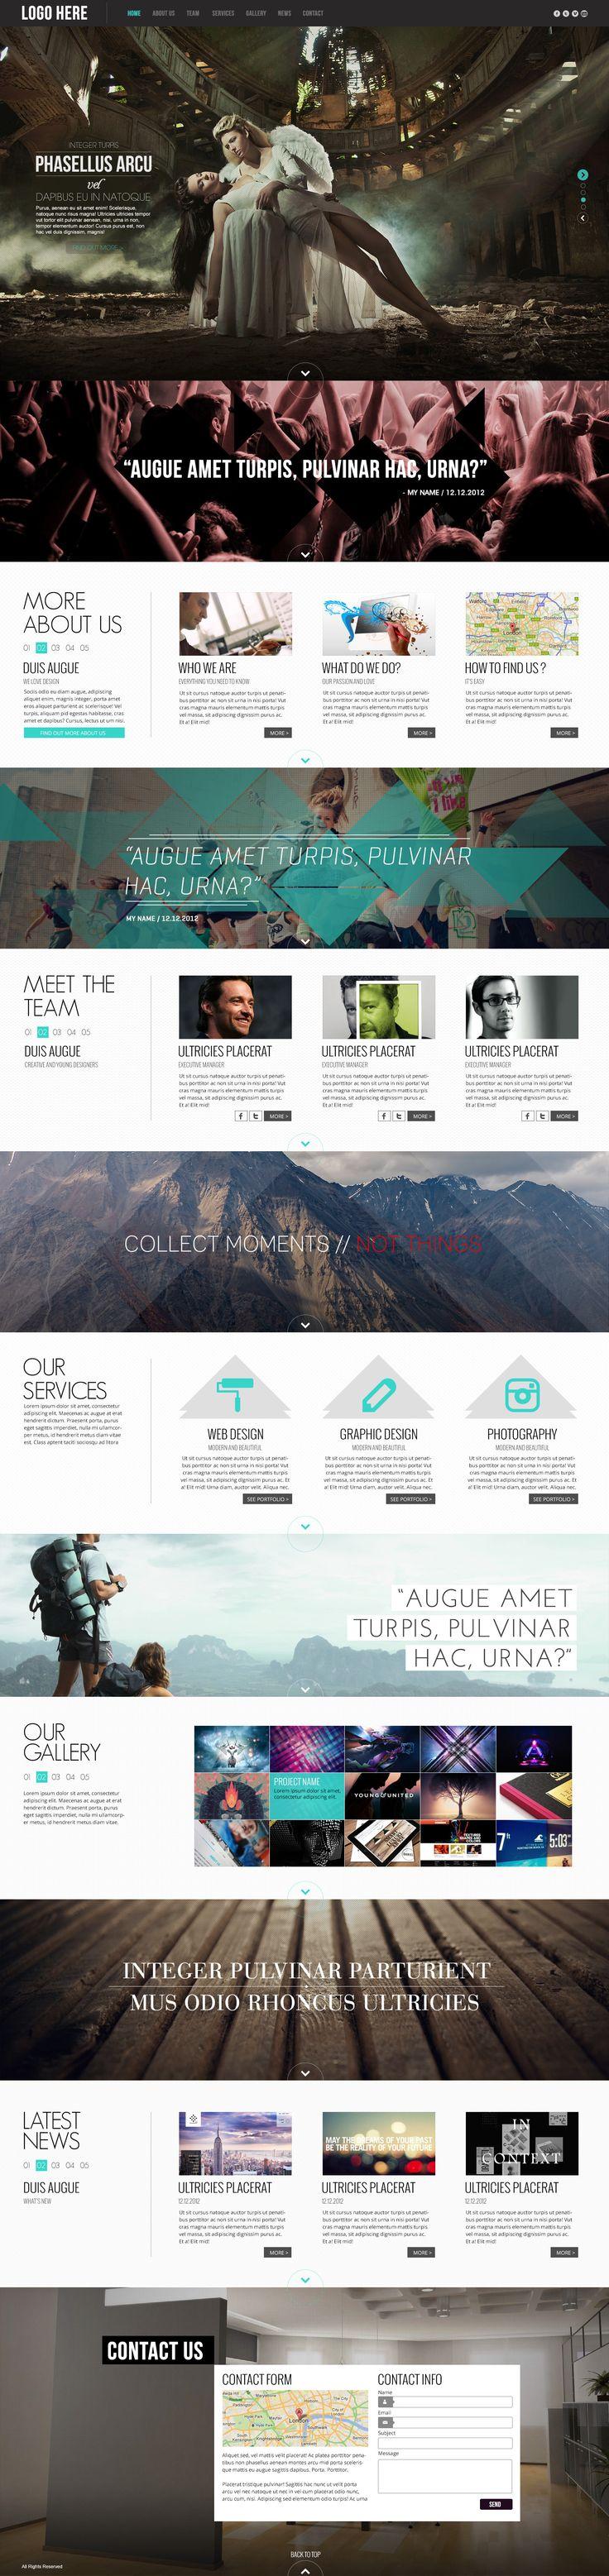 29 best Supreme Parallax Web Design images on Pinterest | Website ...